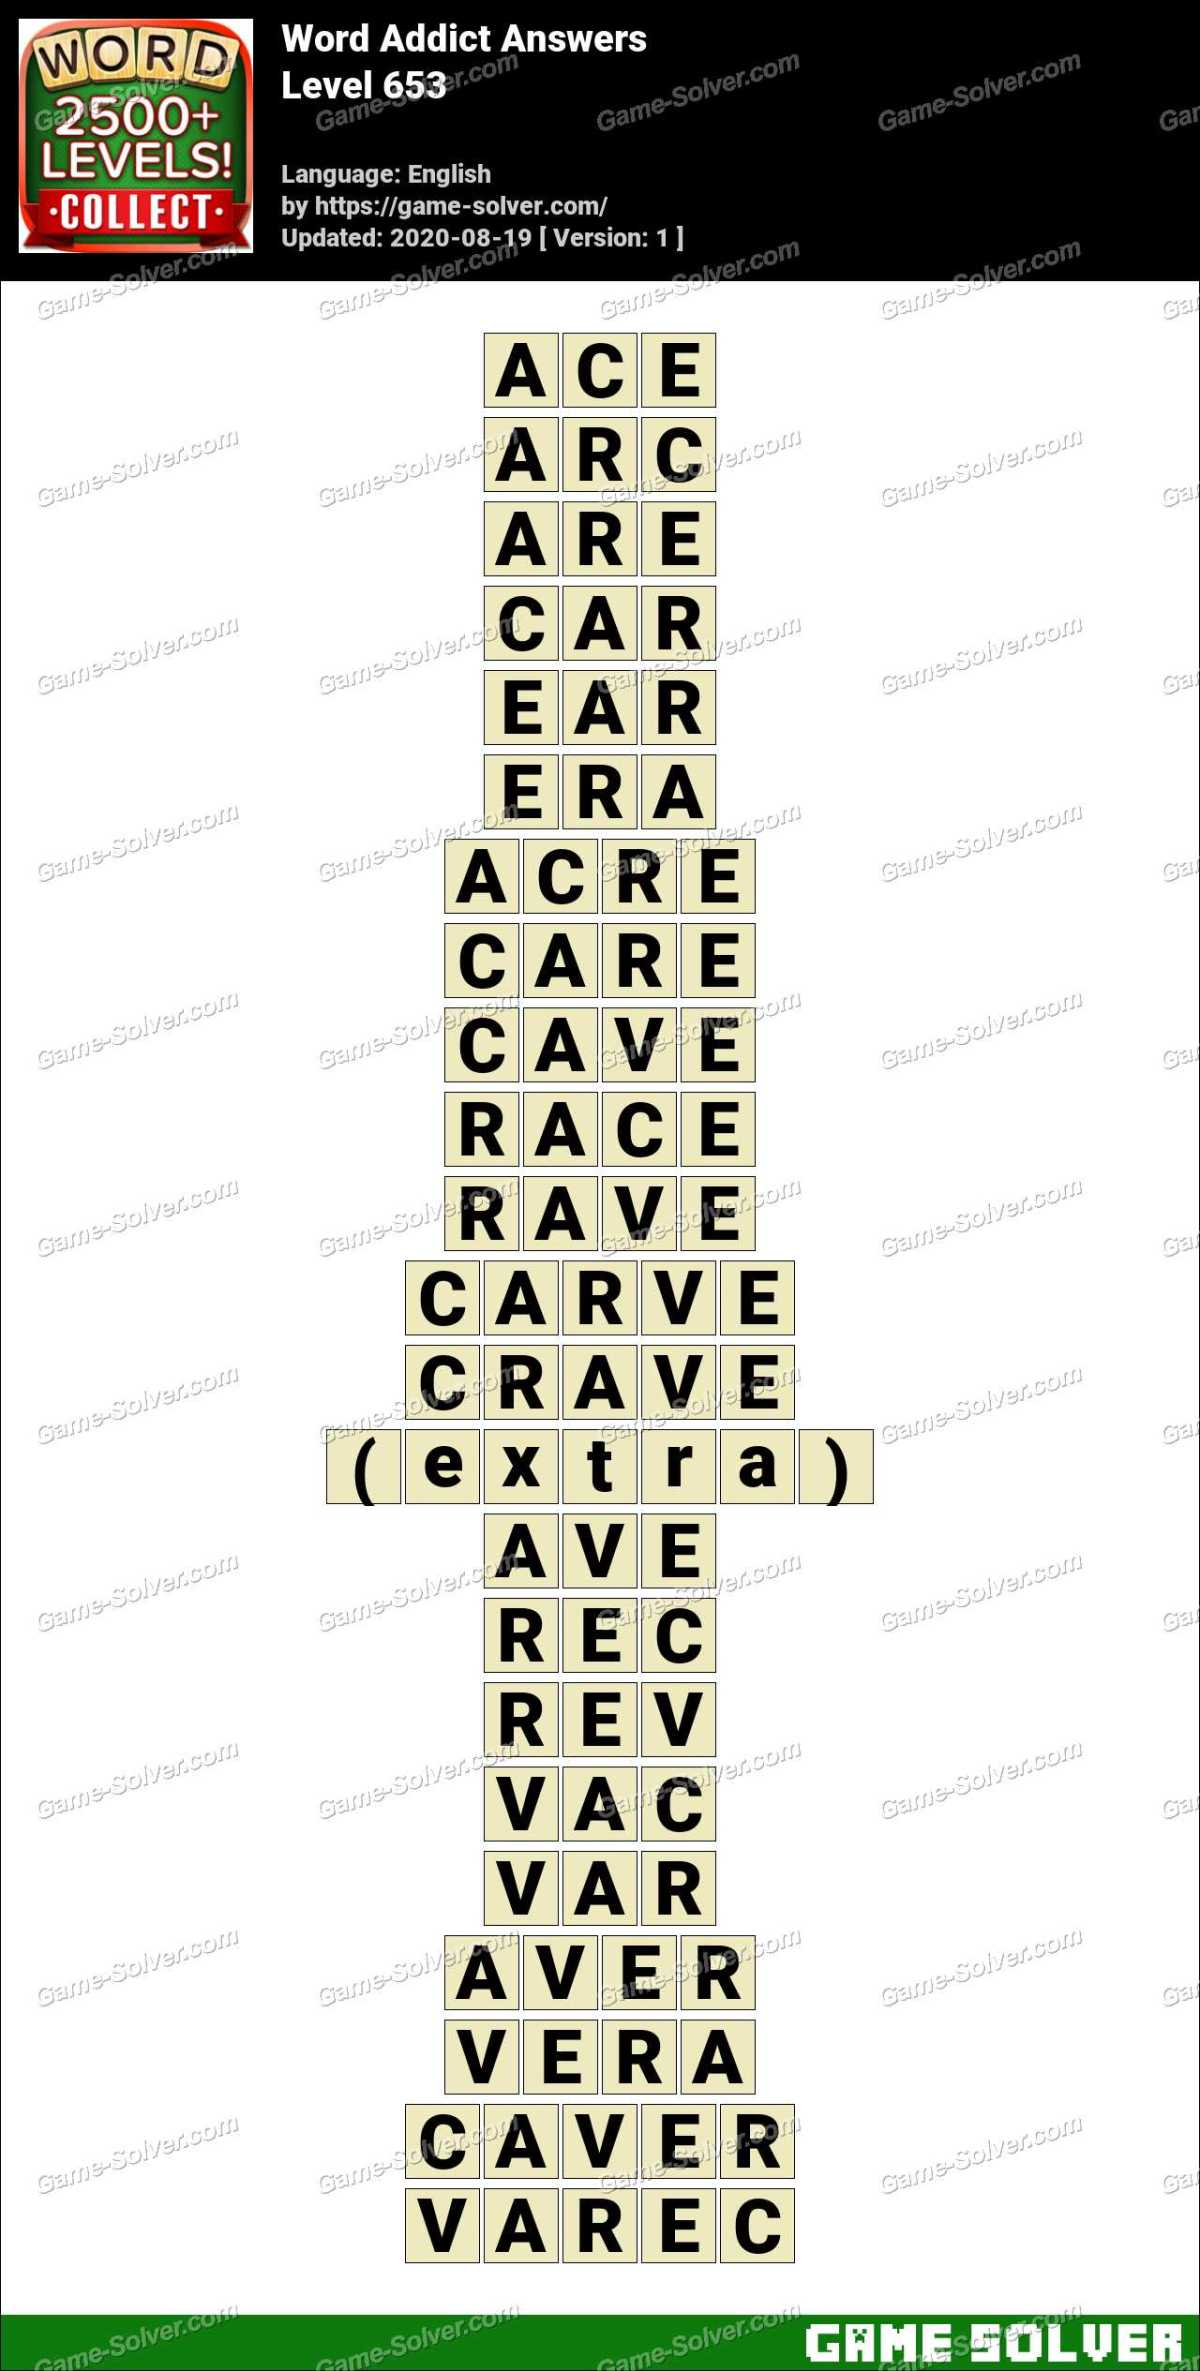 Word Addict Level 653 Answers